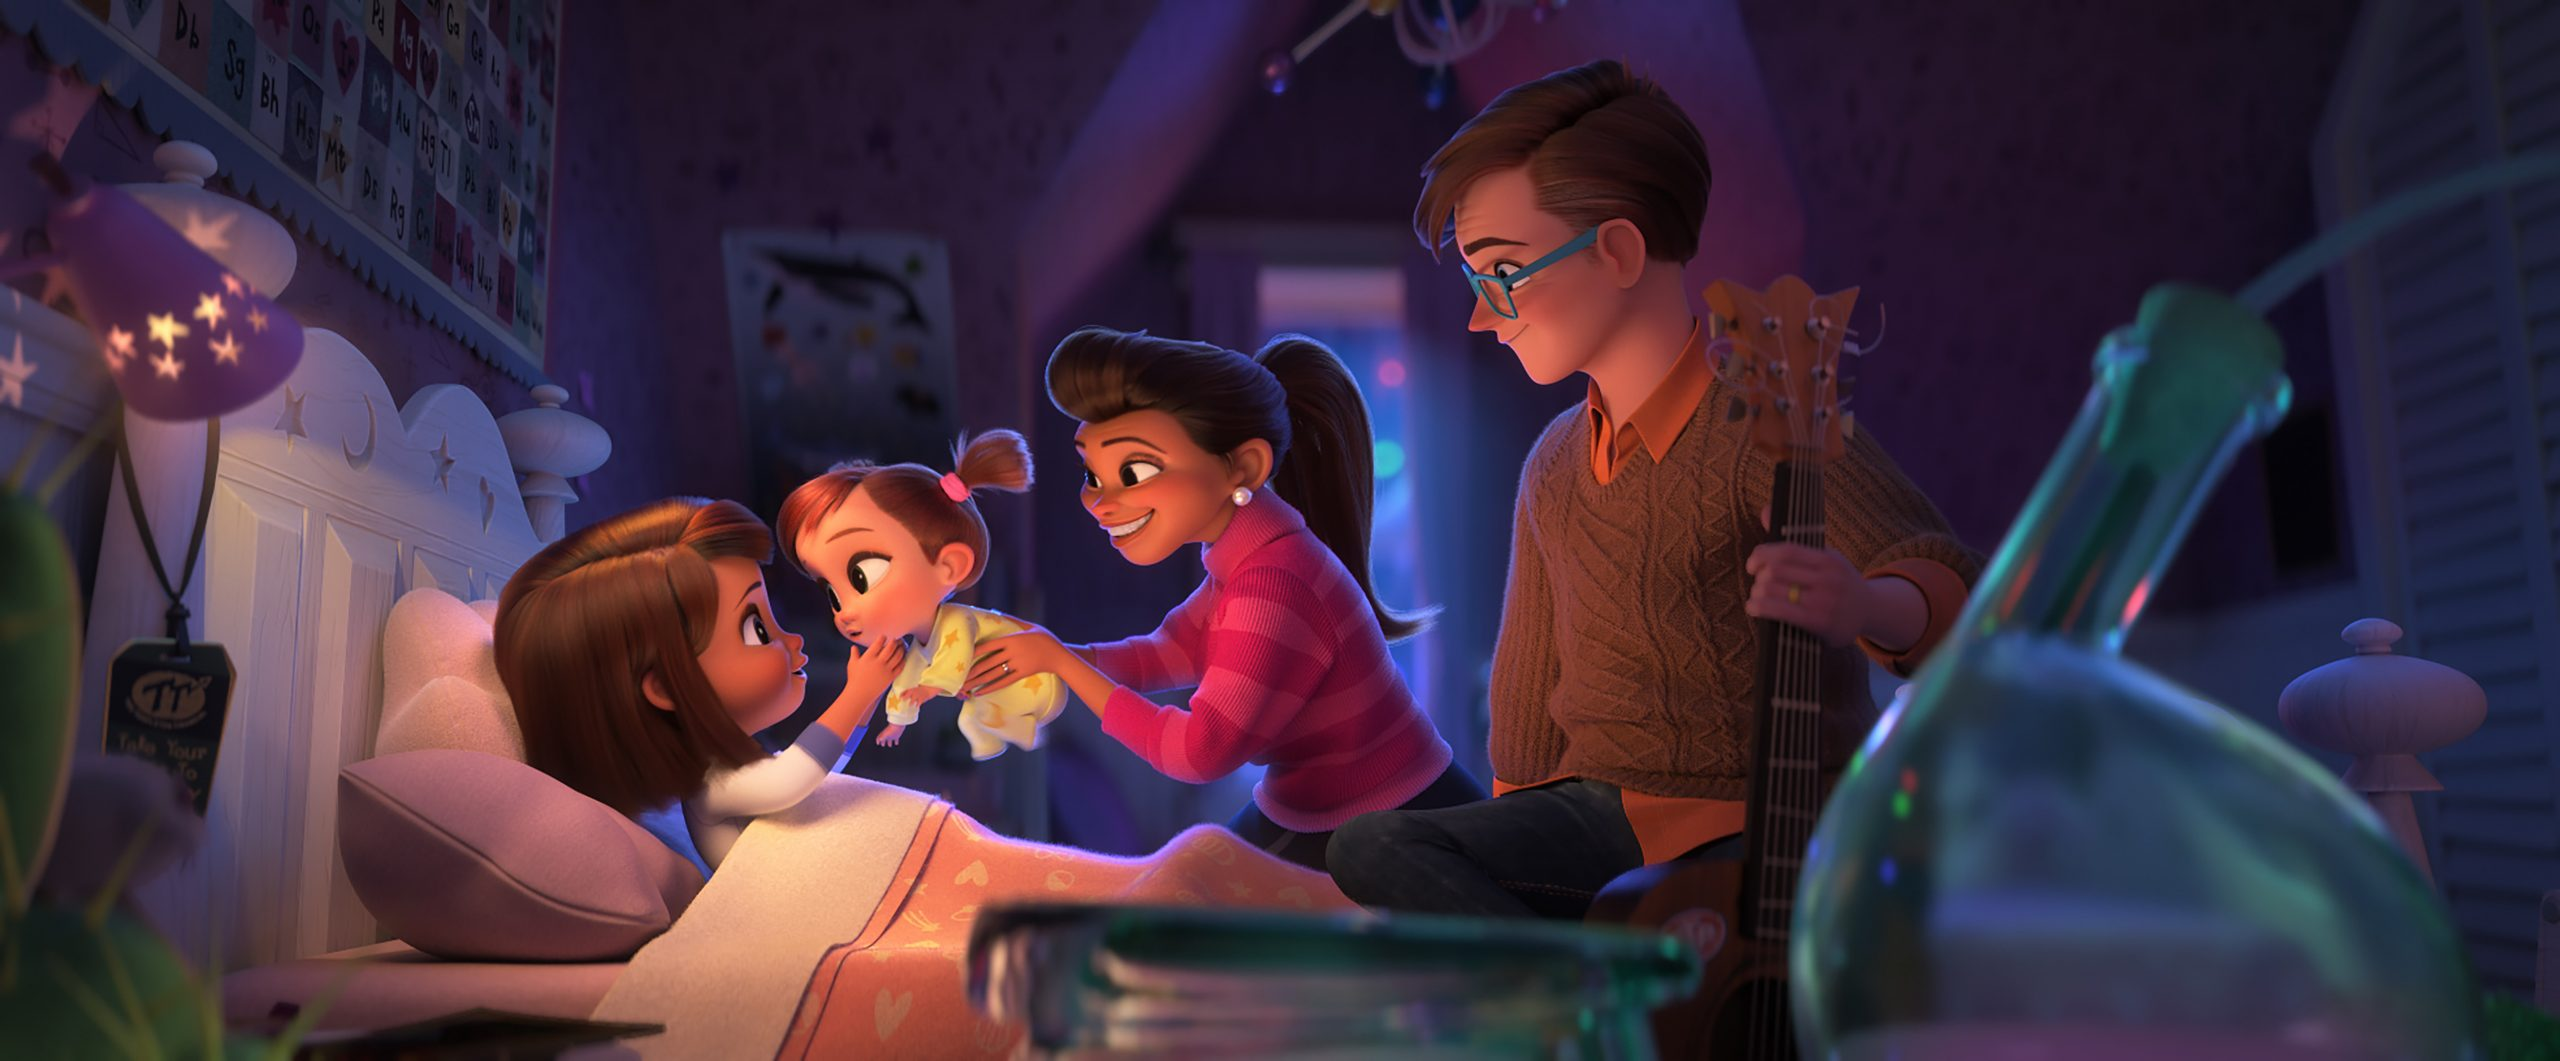 (from left) Tabitha Templeton (Ariana Greenblatt), Tina Templeton (Amy Sedaris), Carol Templeton (Eva Longoria) and Tim Templeton (James Marsden) in DreamWorks Animation's The Boss Baby: Family Business, directed by Tom McGrath.